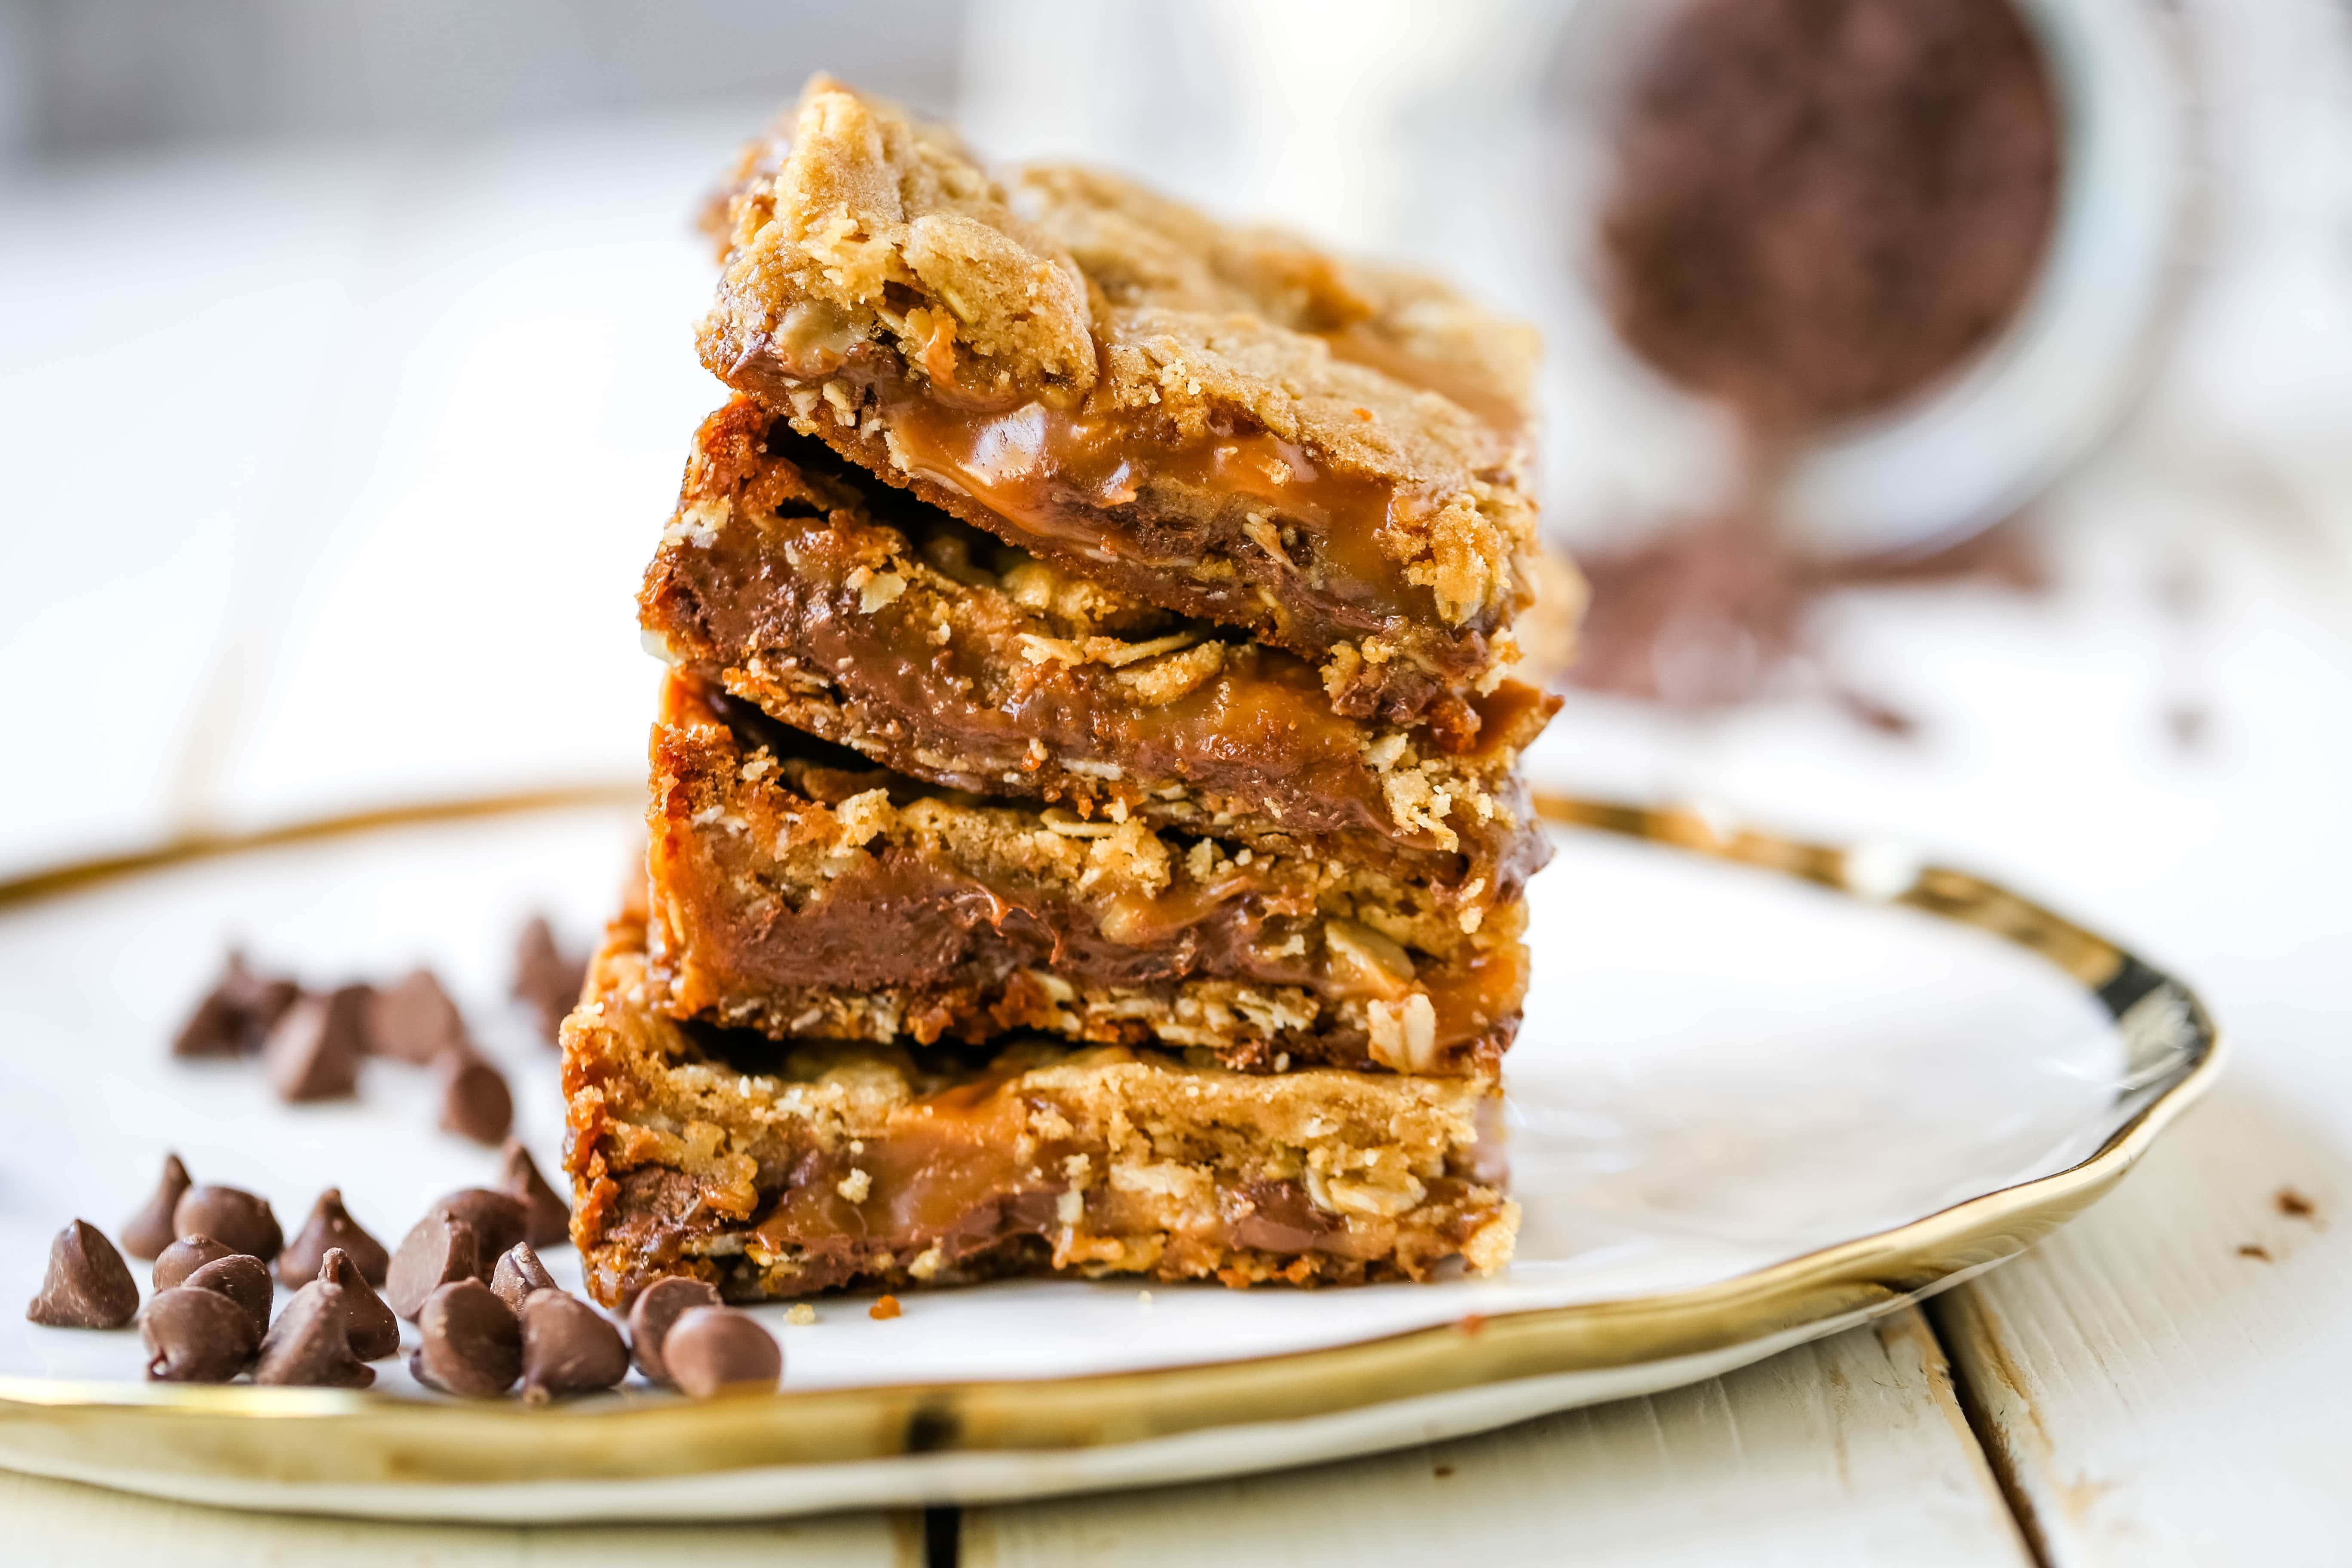 Caramelitas Chocolate Caramel Oatmeal Bars. Buttery oatmeal cookie layer with gooey sweet caramel and rich milk chocolate. The perfect caramelita bar recipe! www.modernhoney.com #caramelitas #chocolatecaramelbars #dessertbars